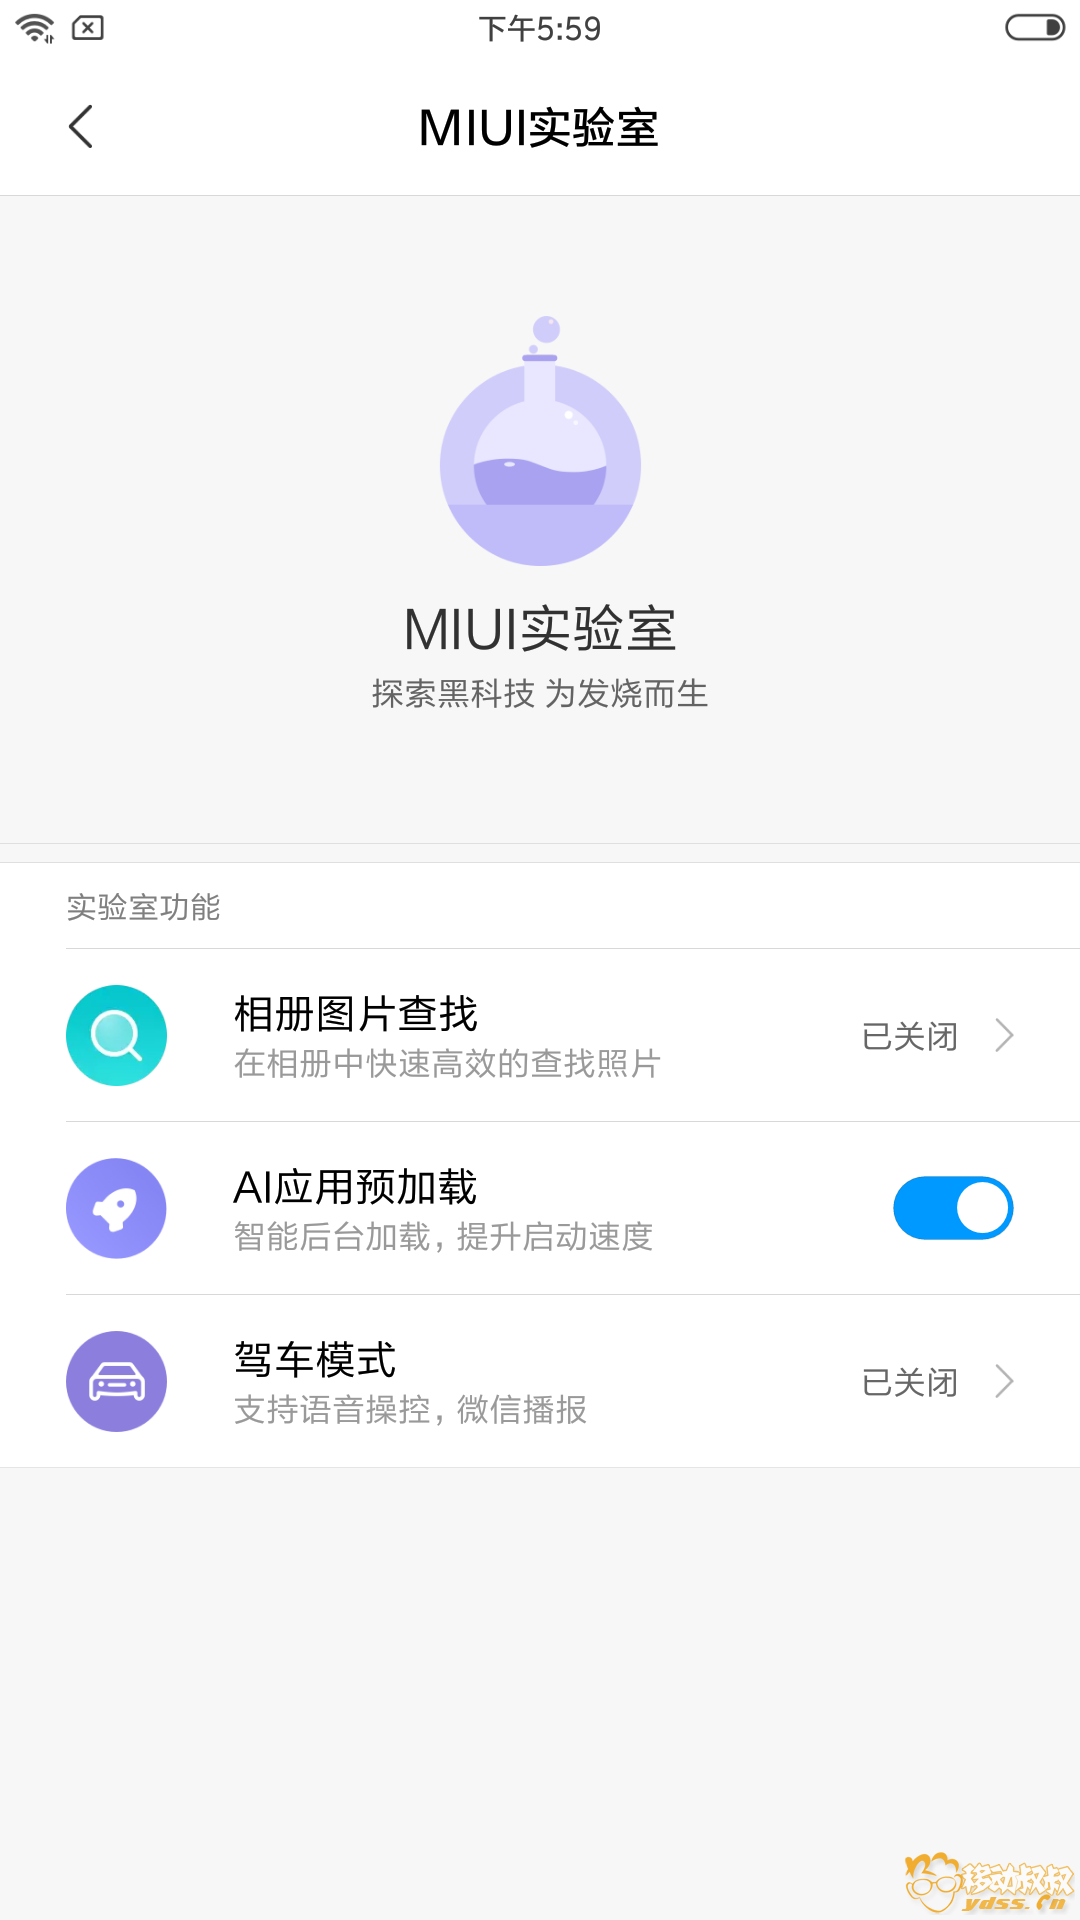 Screenshot_2018-09-06-17-59-03-006_com.android.settings.png